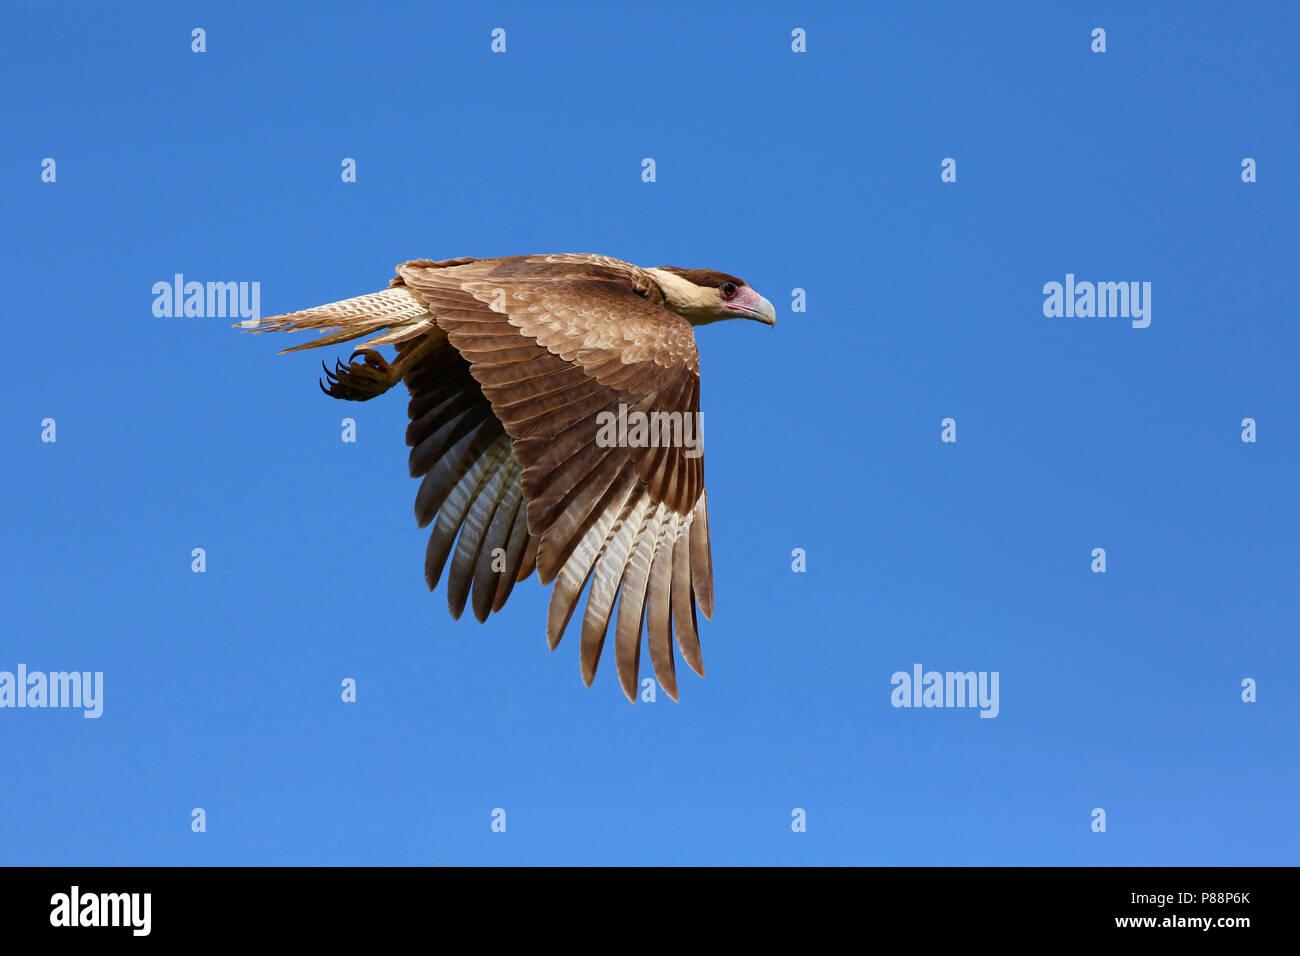 vliegende kuifcaracara; flying Crested Caracara Stock Photo